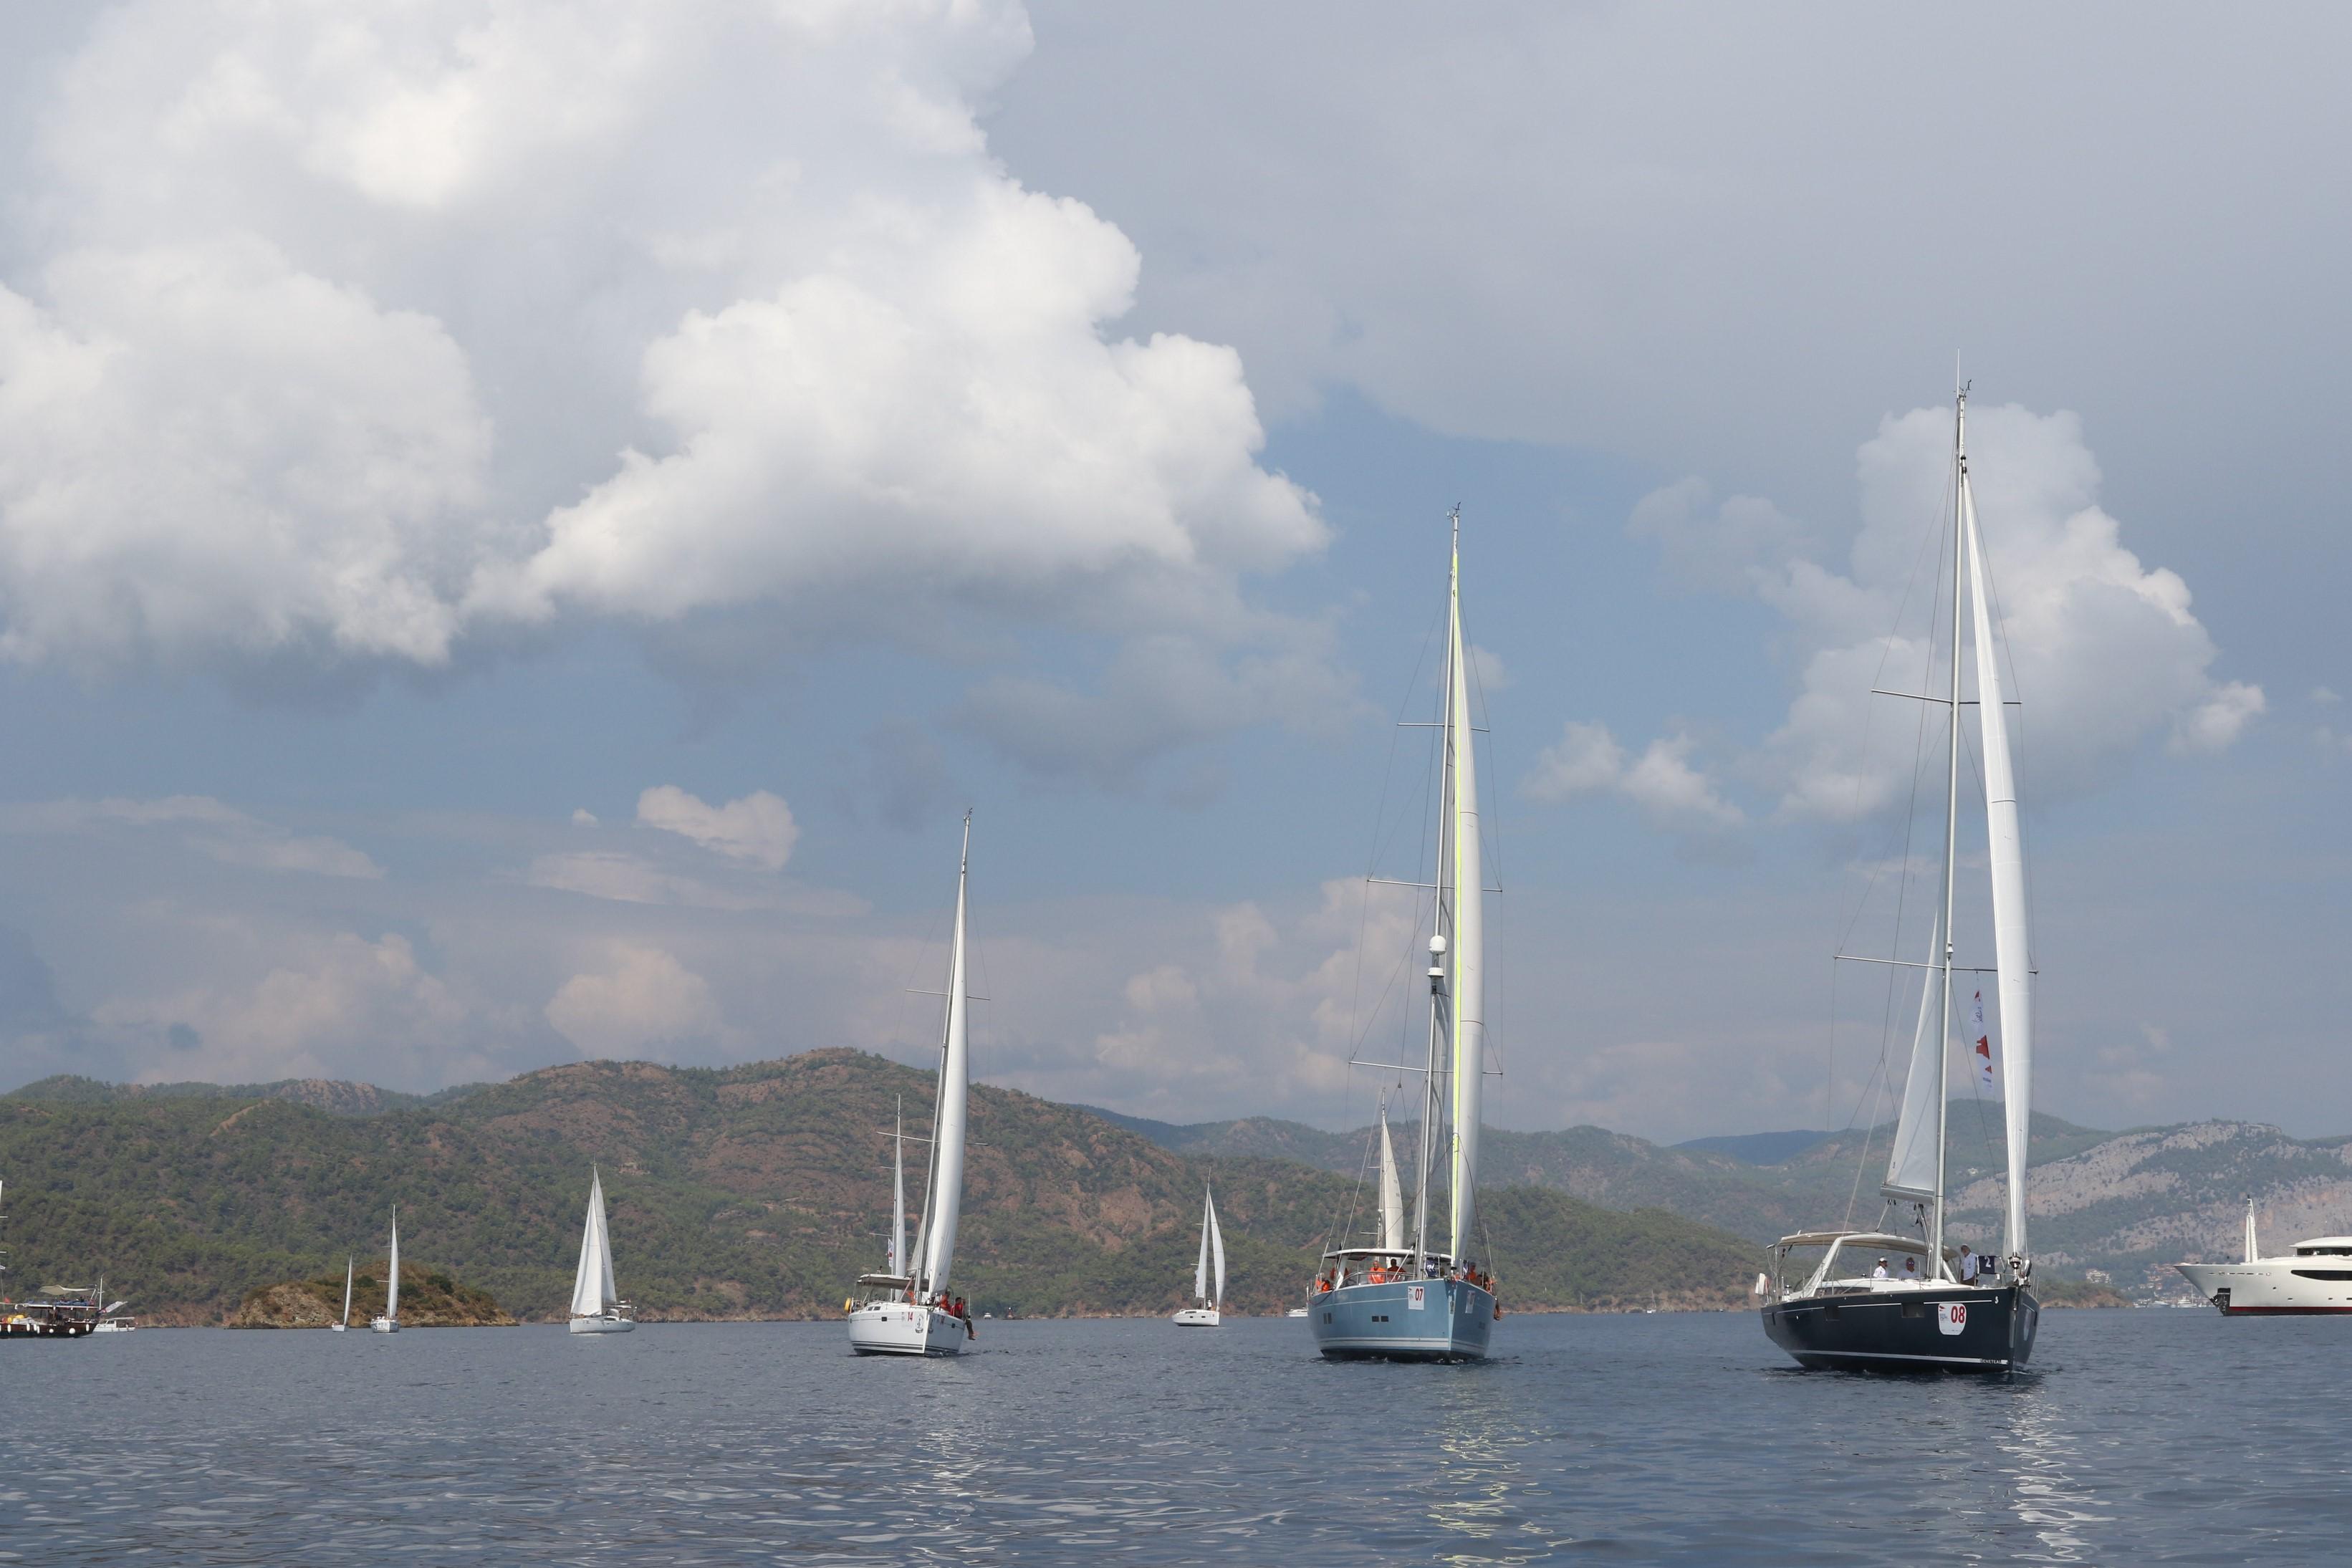 1539600562_rixos_sailing_cup_gocek_2018_2.jpg